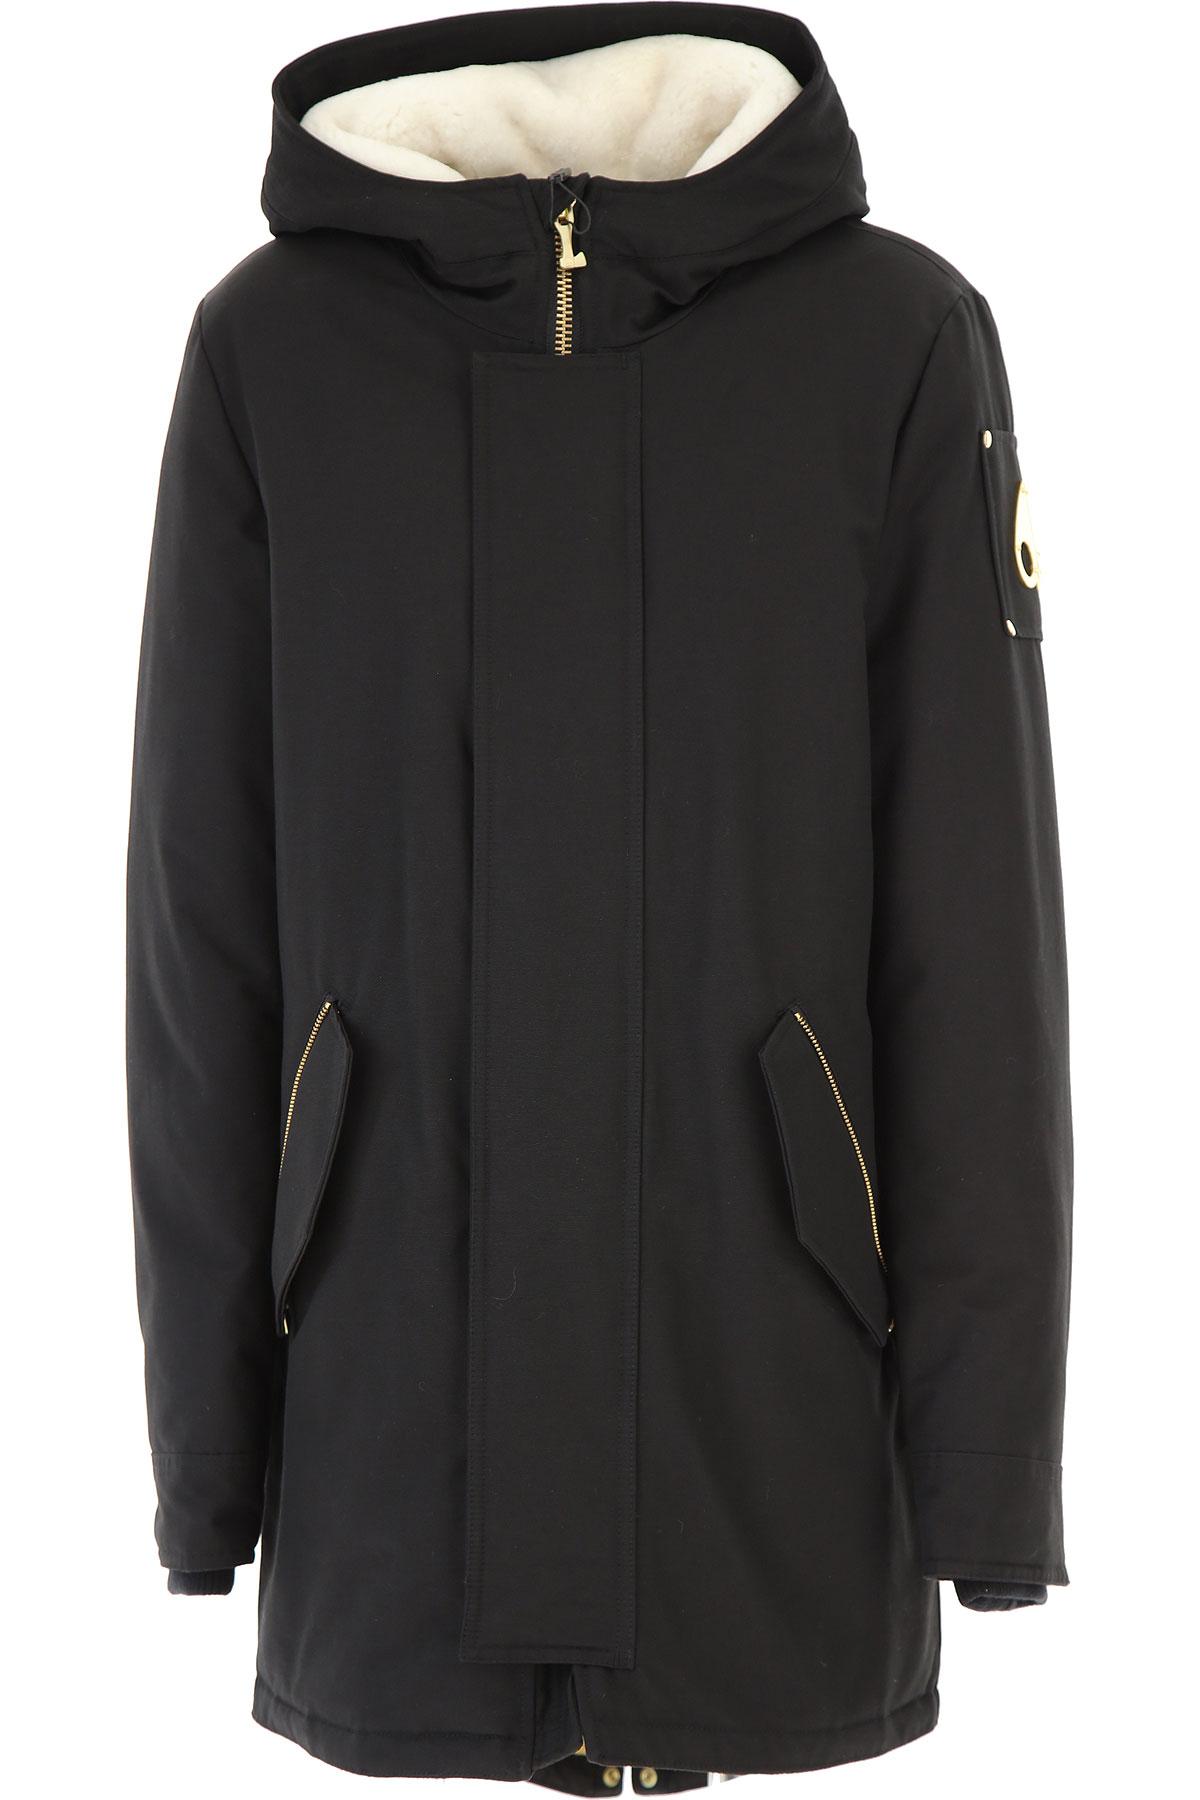 Moose Knuckles Down Jacket for Women, Puffer Ski Jacket On Sale, Black, Cotton, 2019, 4 6 8